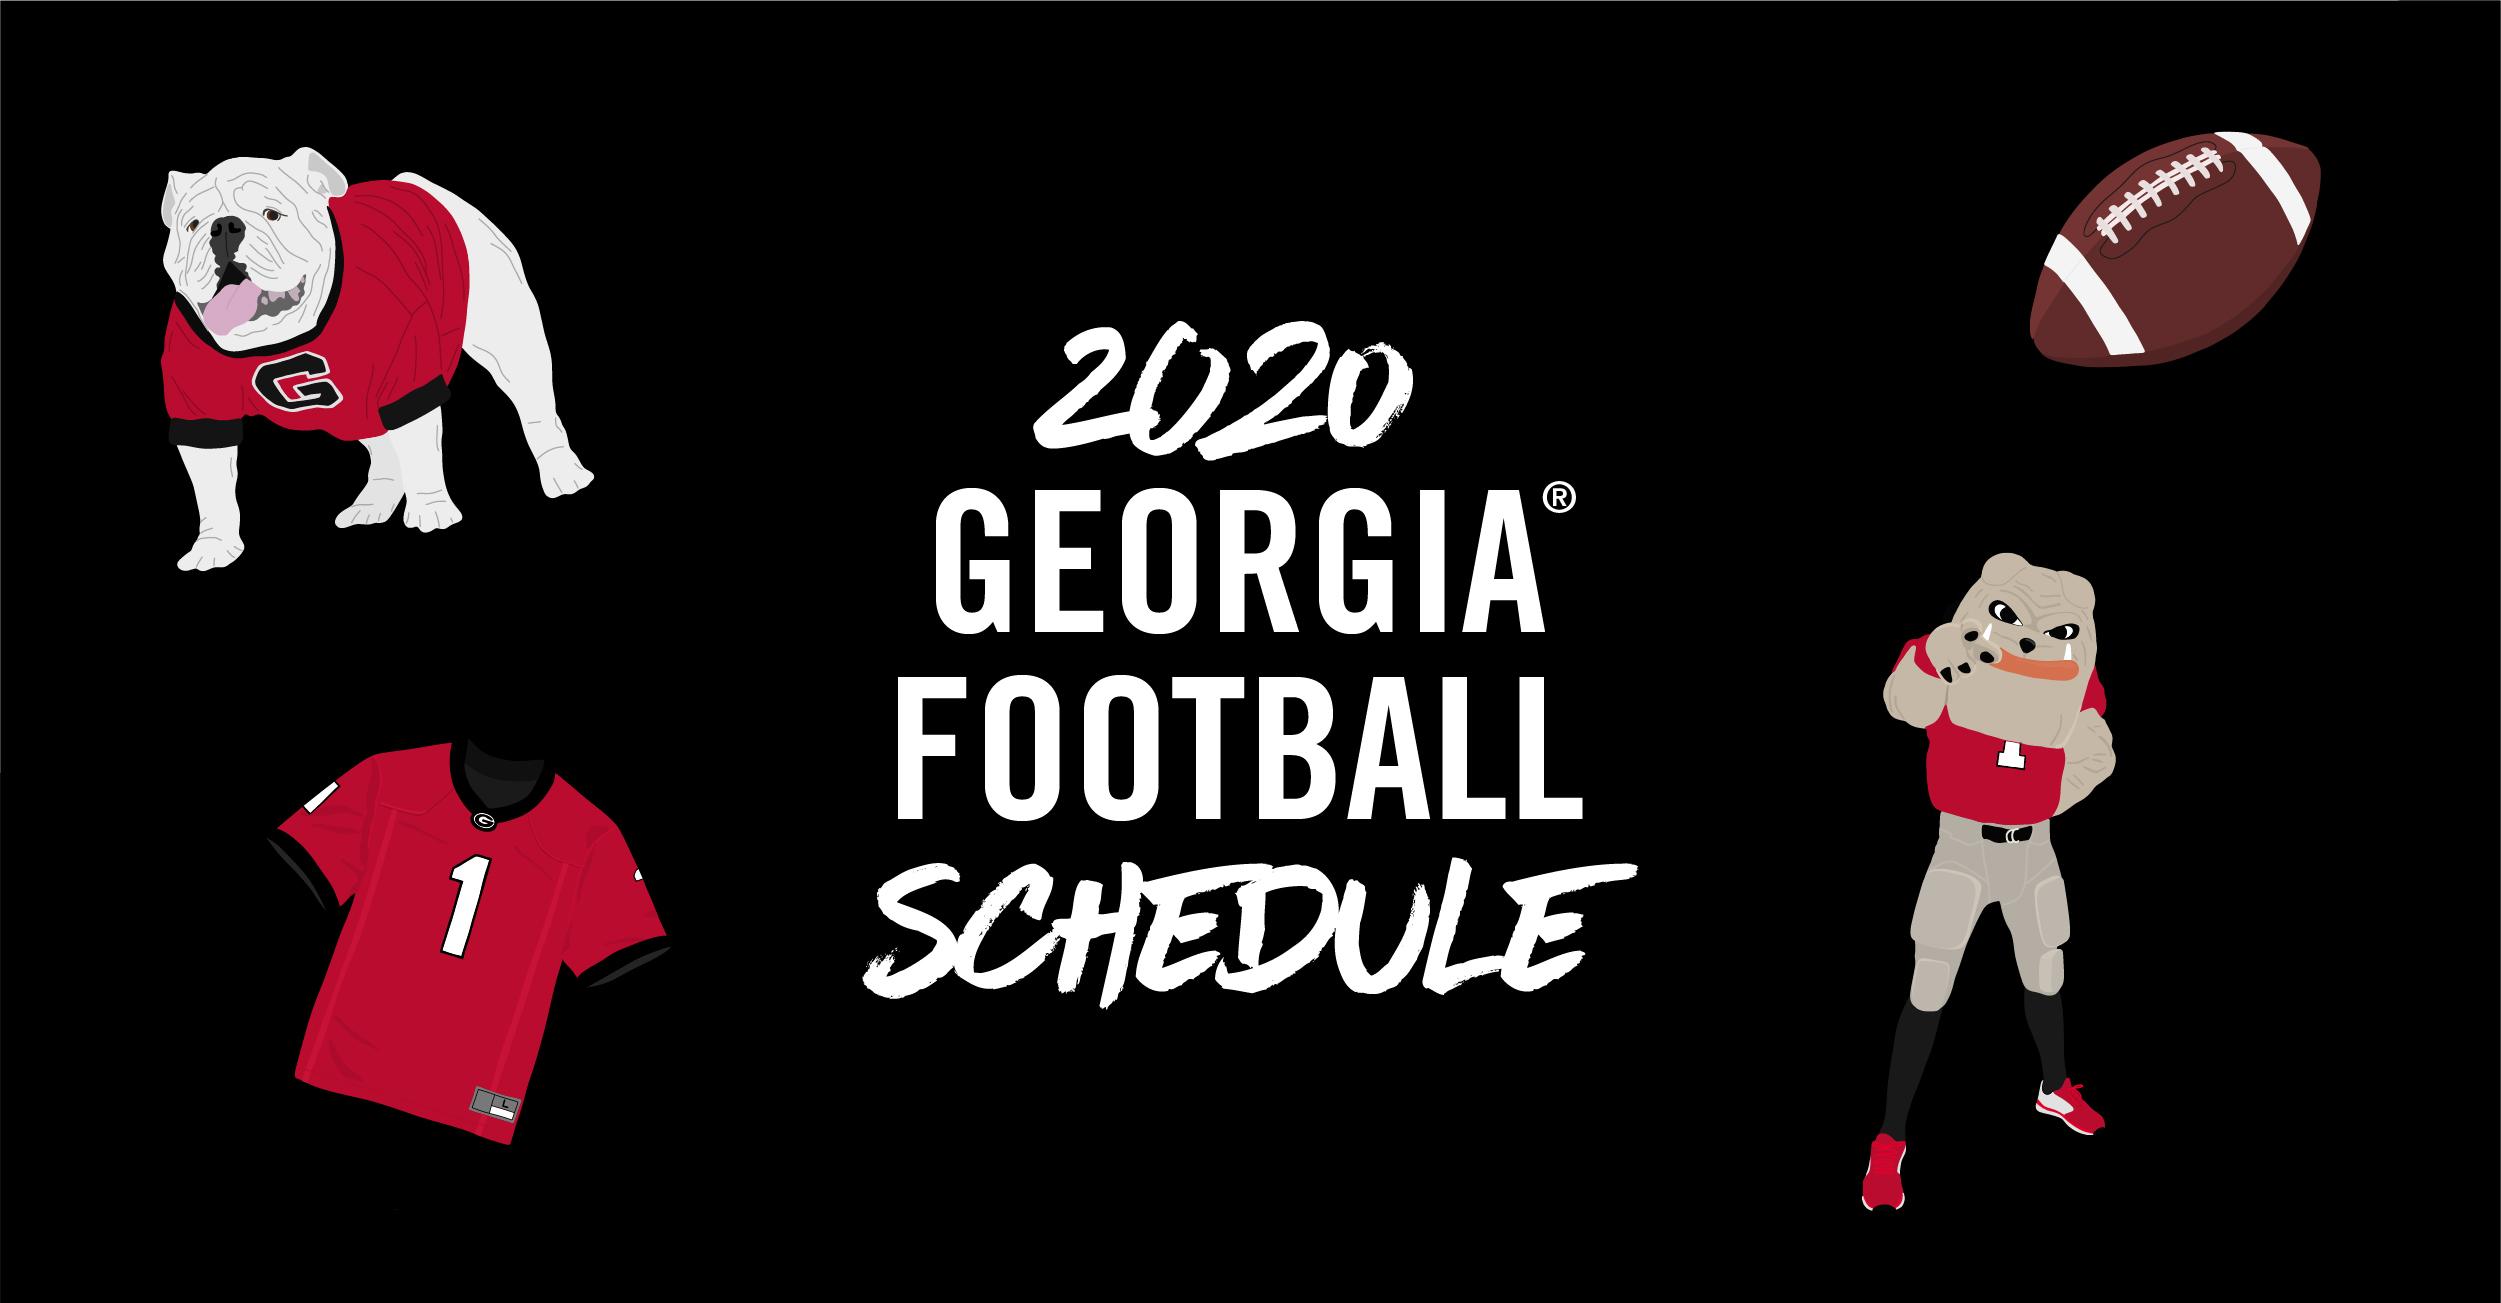 Previewing The New 2020 Uga Football Schedule Uga Alumni